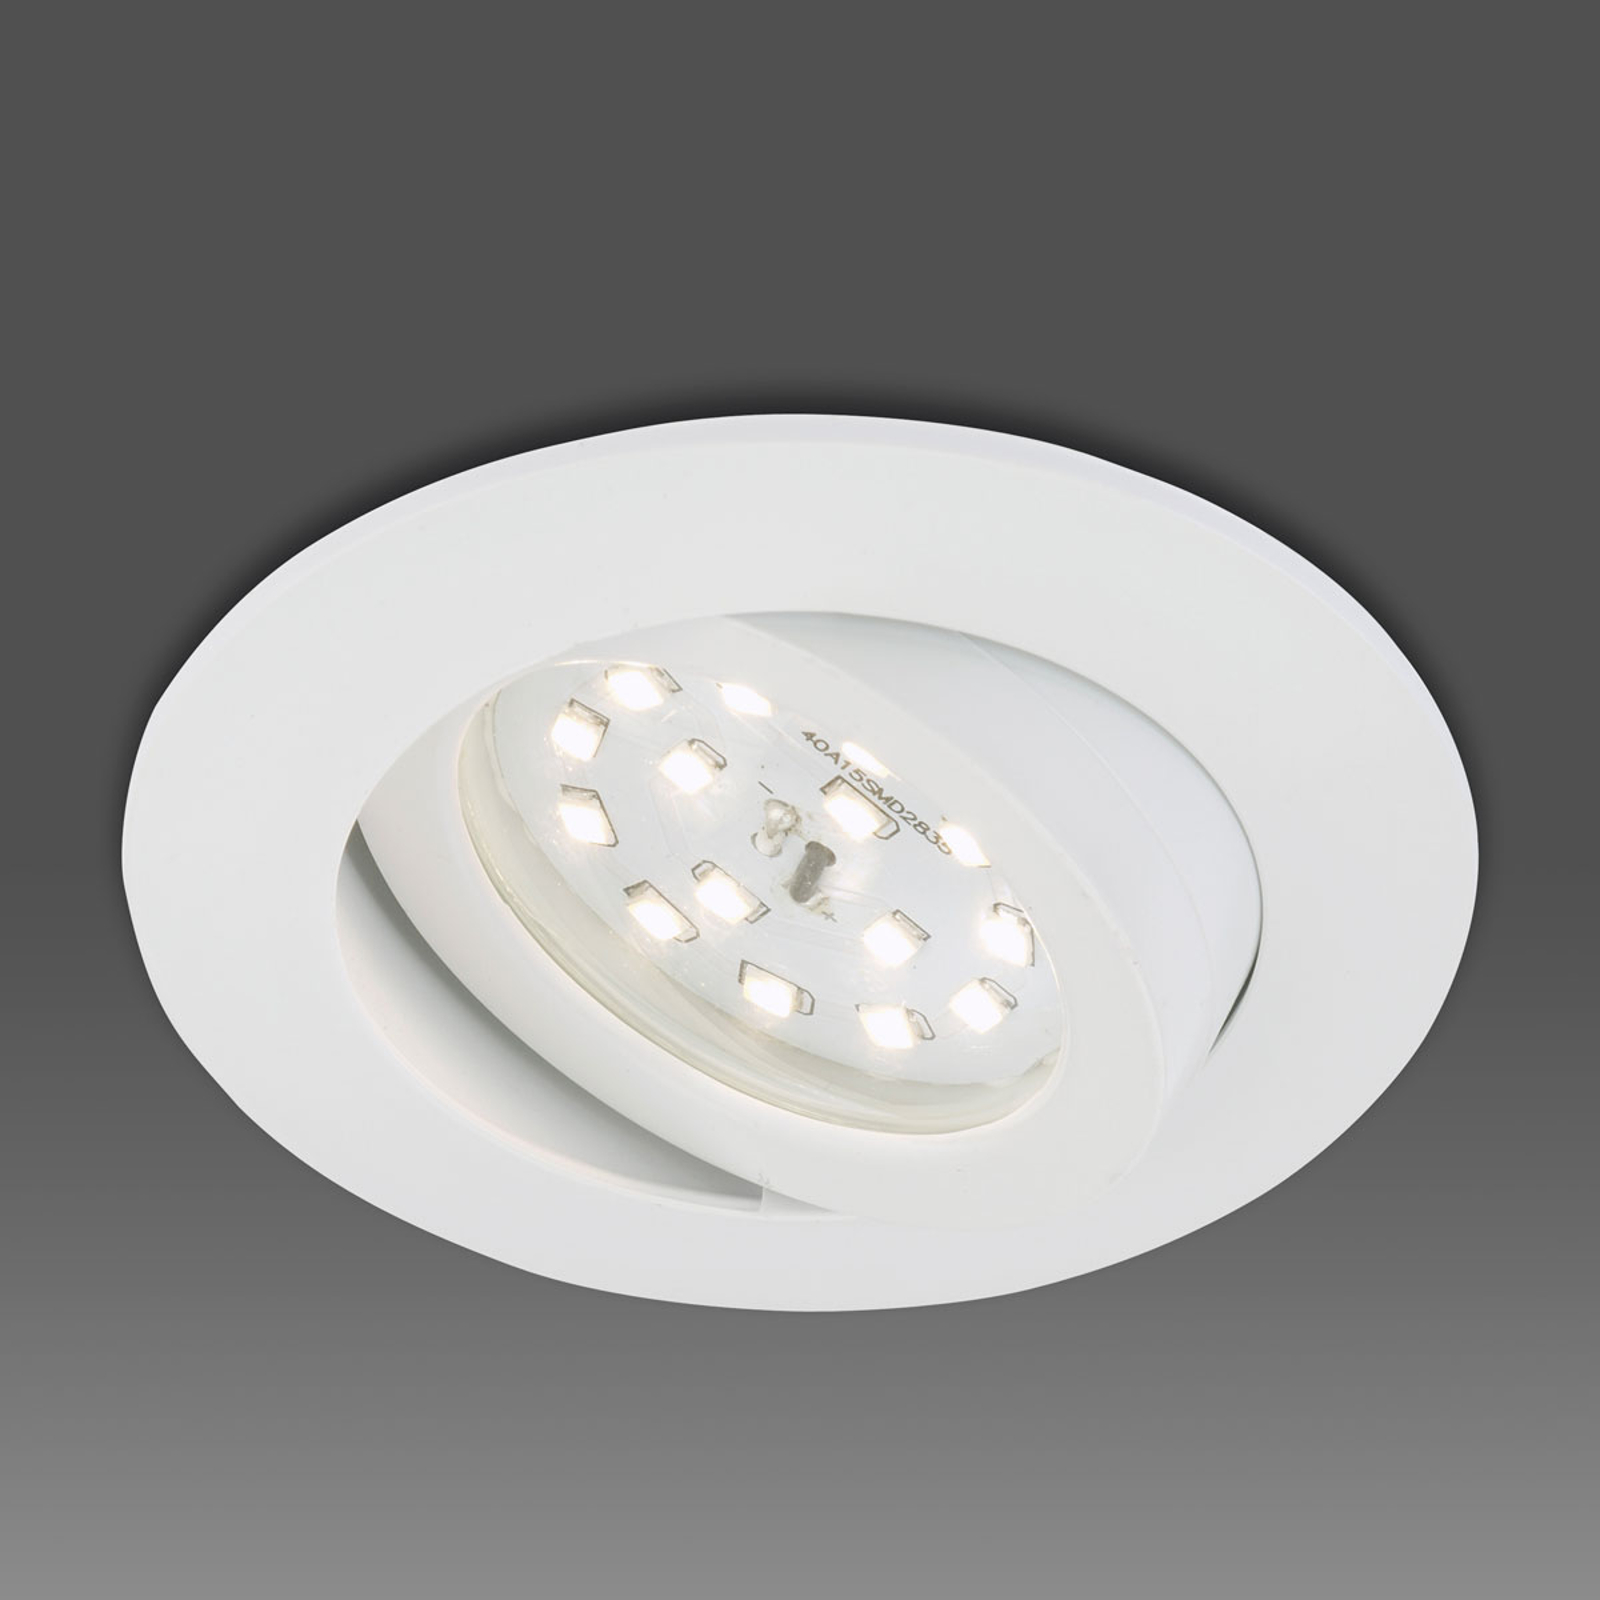 Schwenkbarer LED-Einbaustrahler Erik weiß